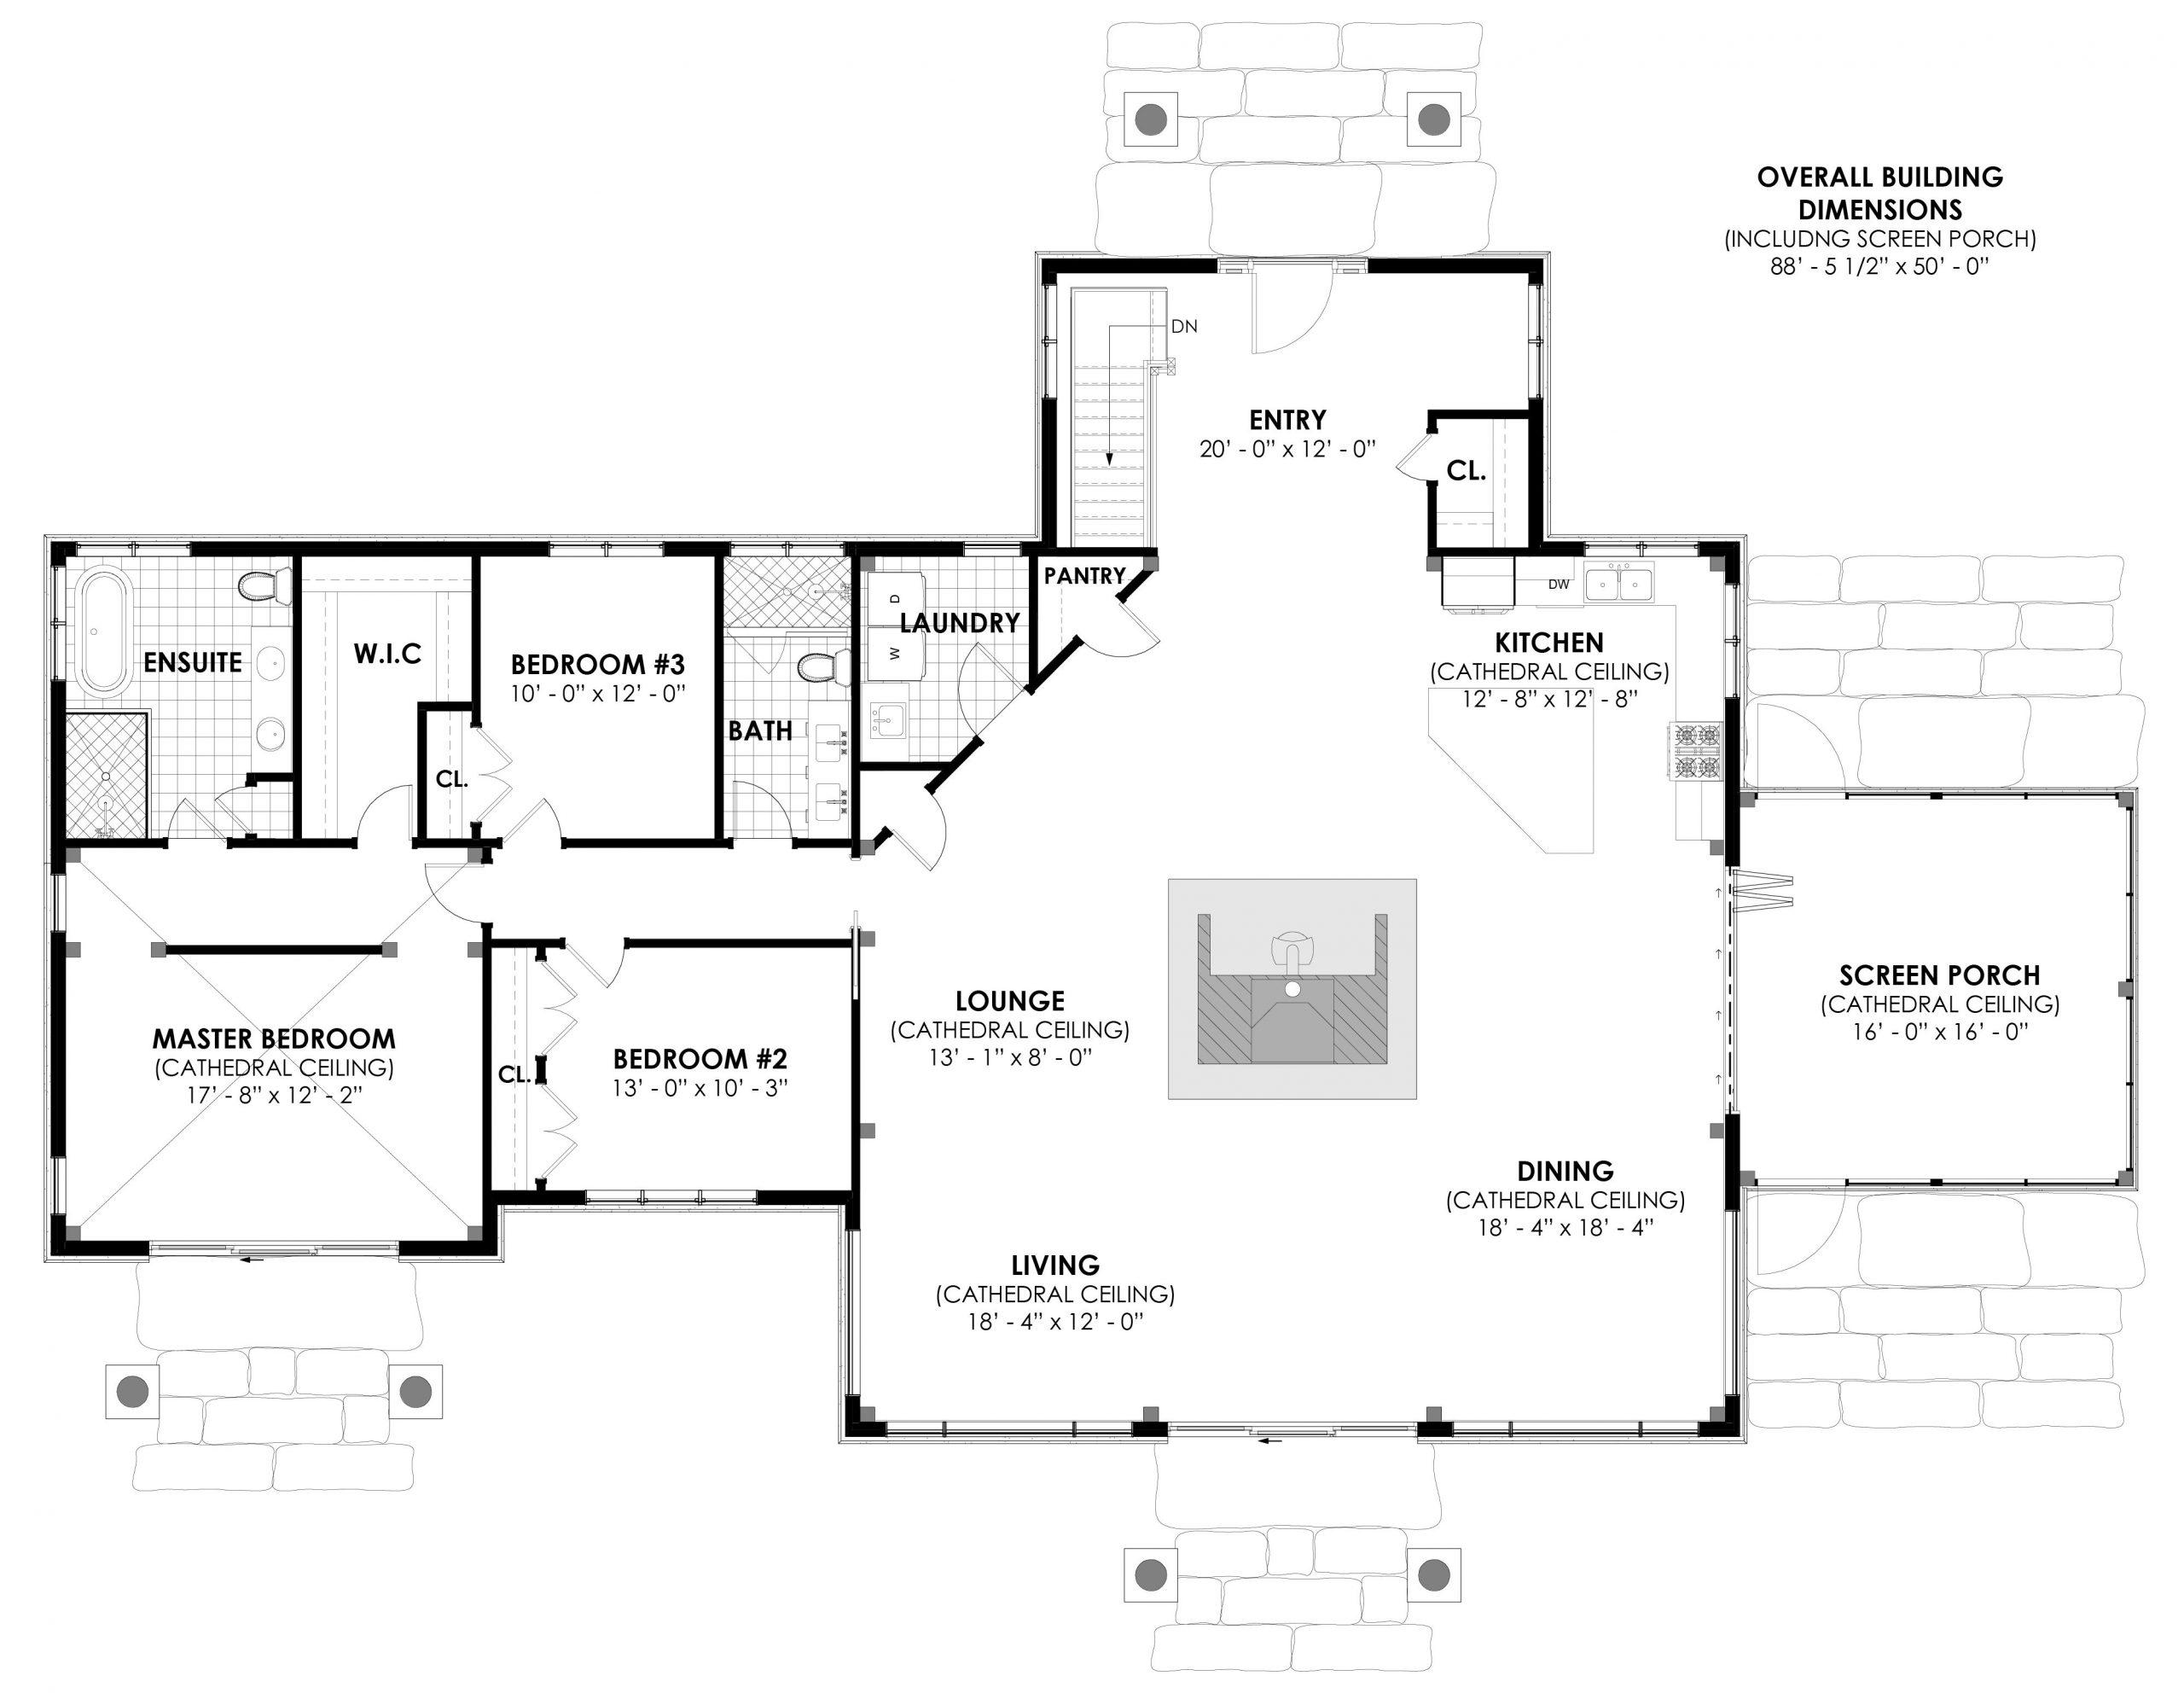 Normerica Timber Frames, House Plan, The Britt 3954, First Floor Layout